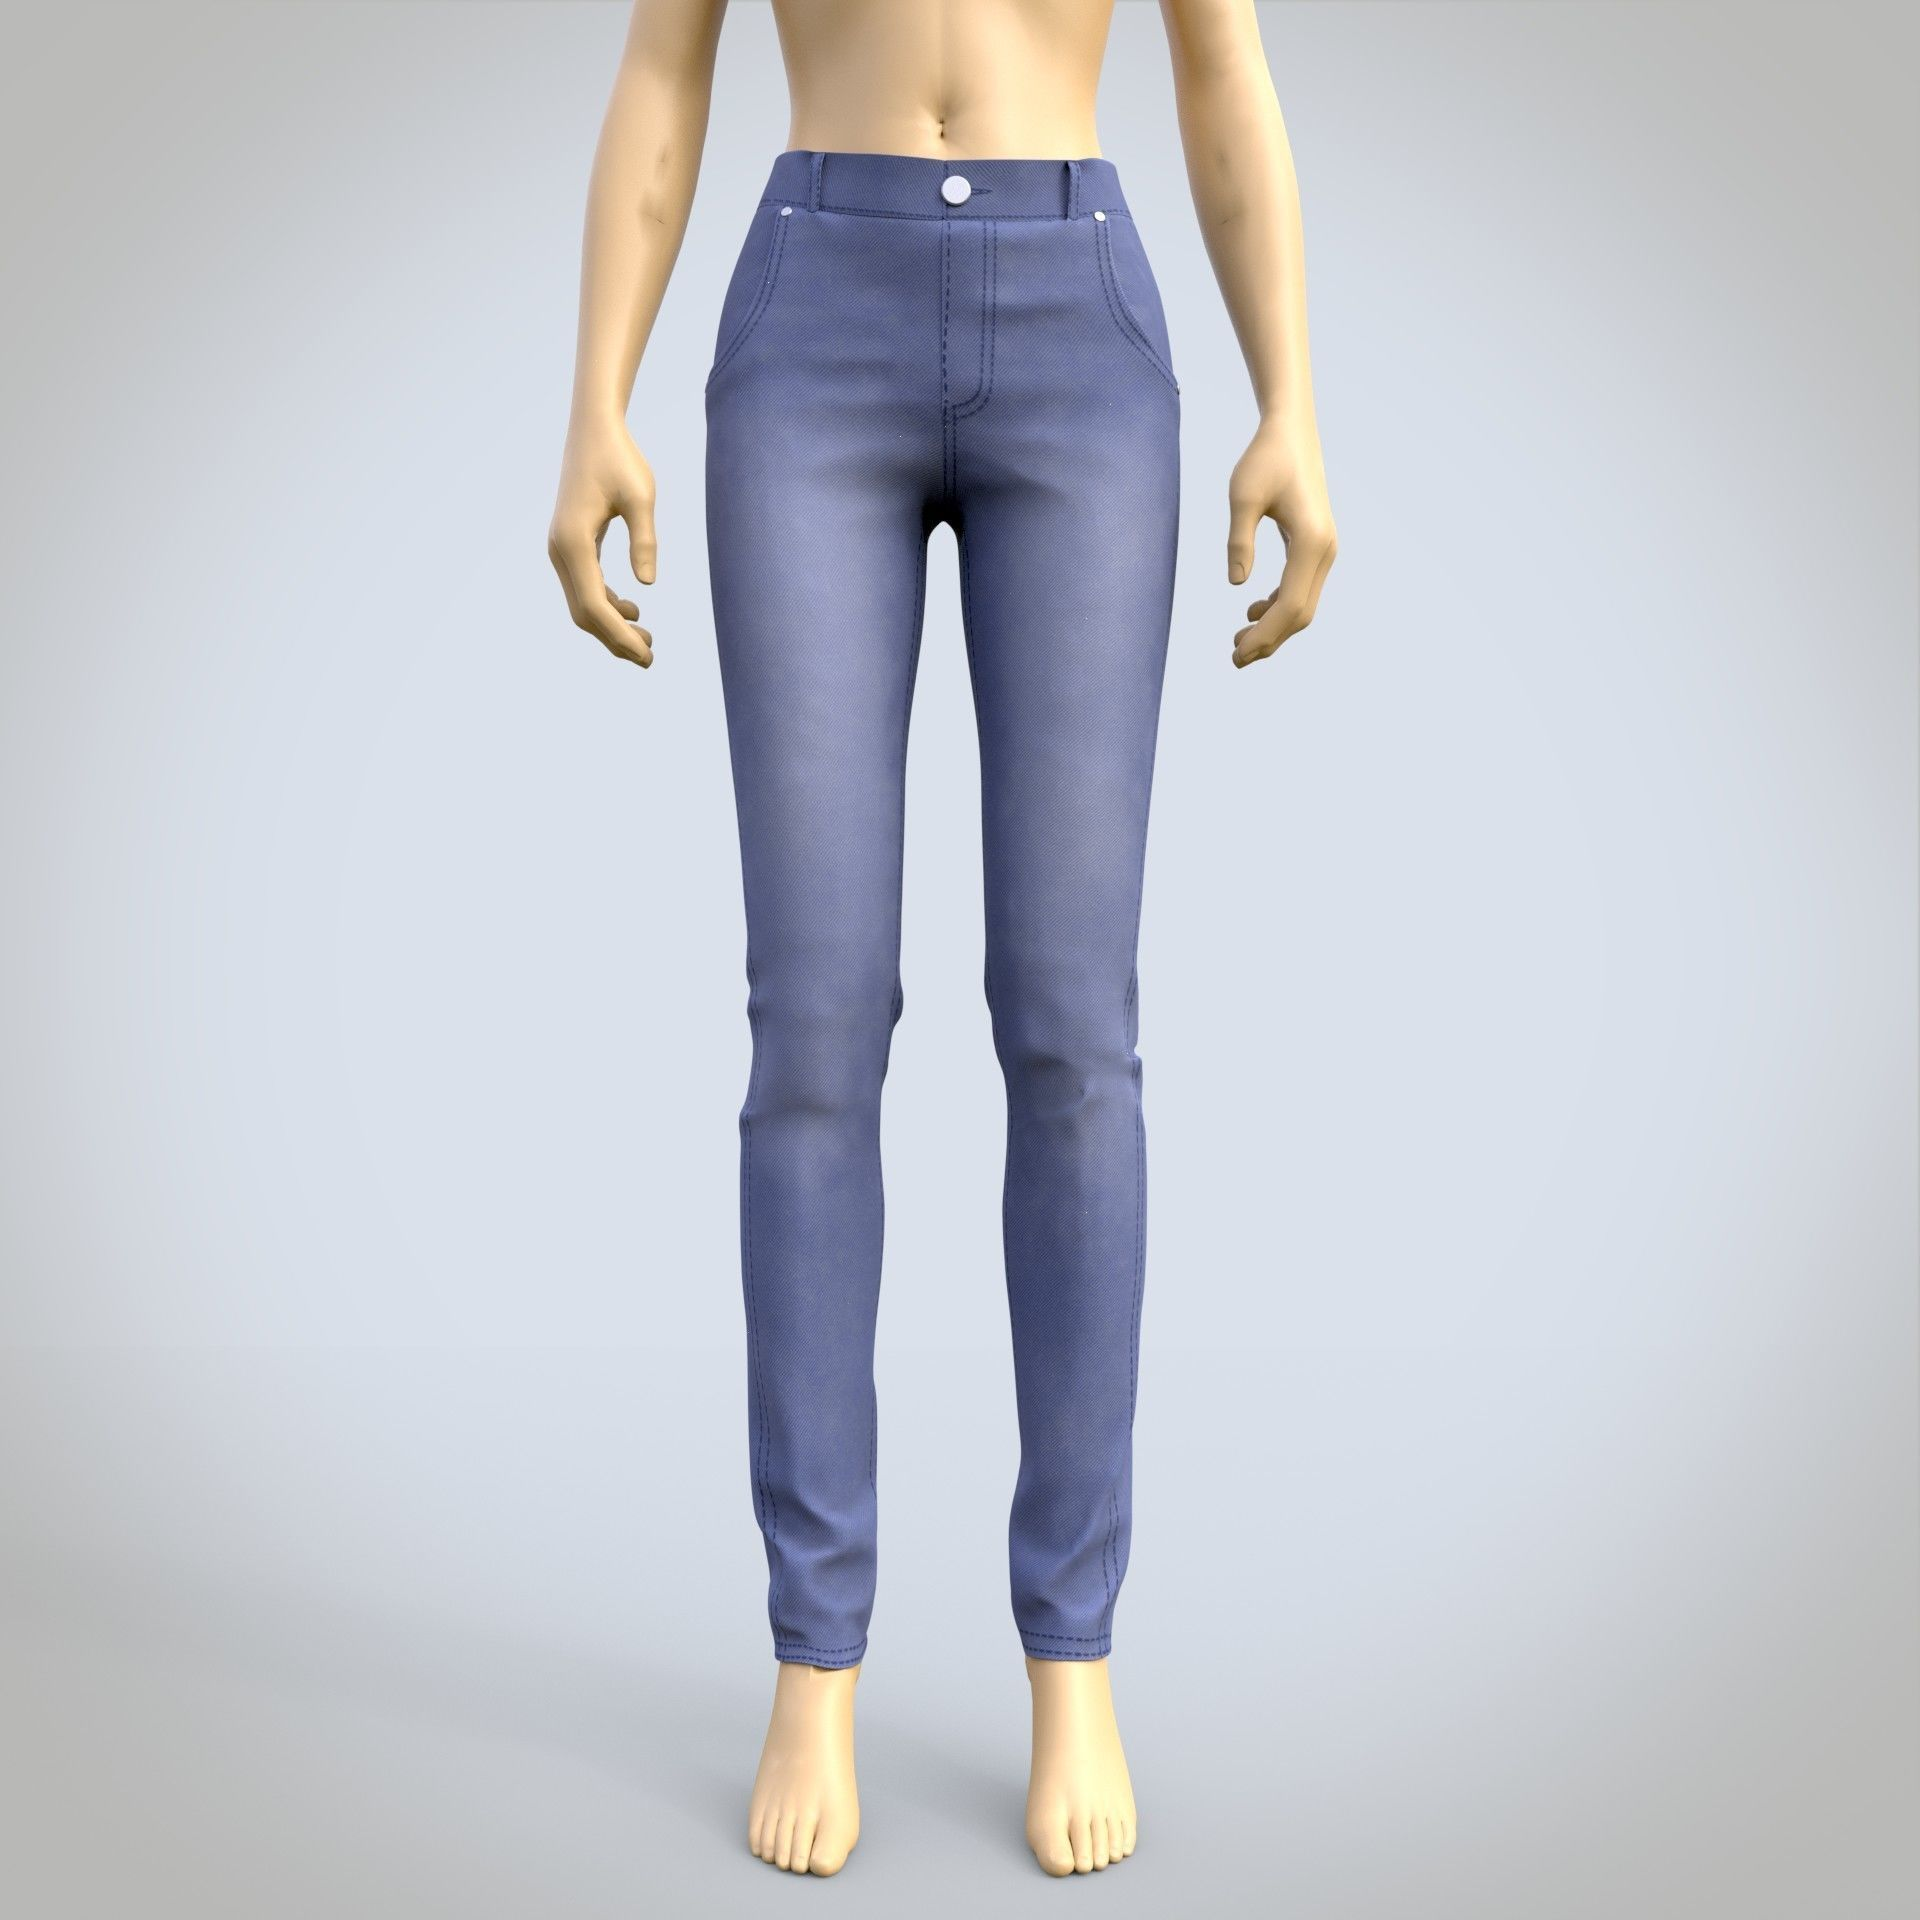 female jeans denim pants